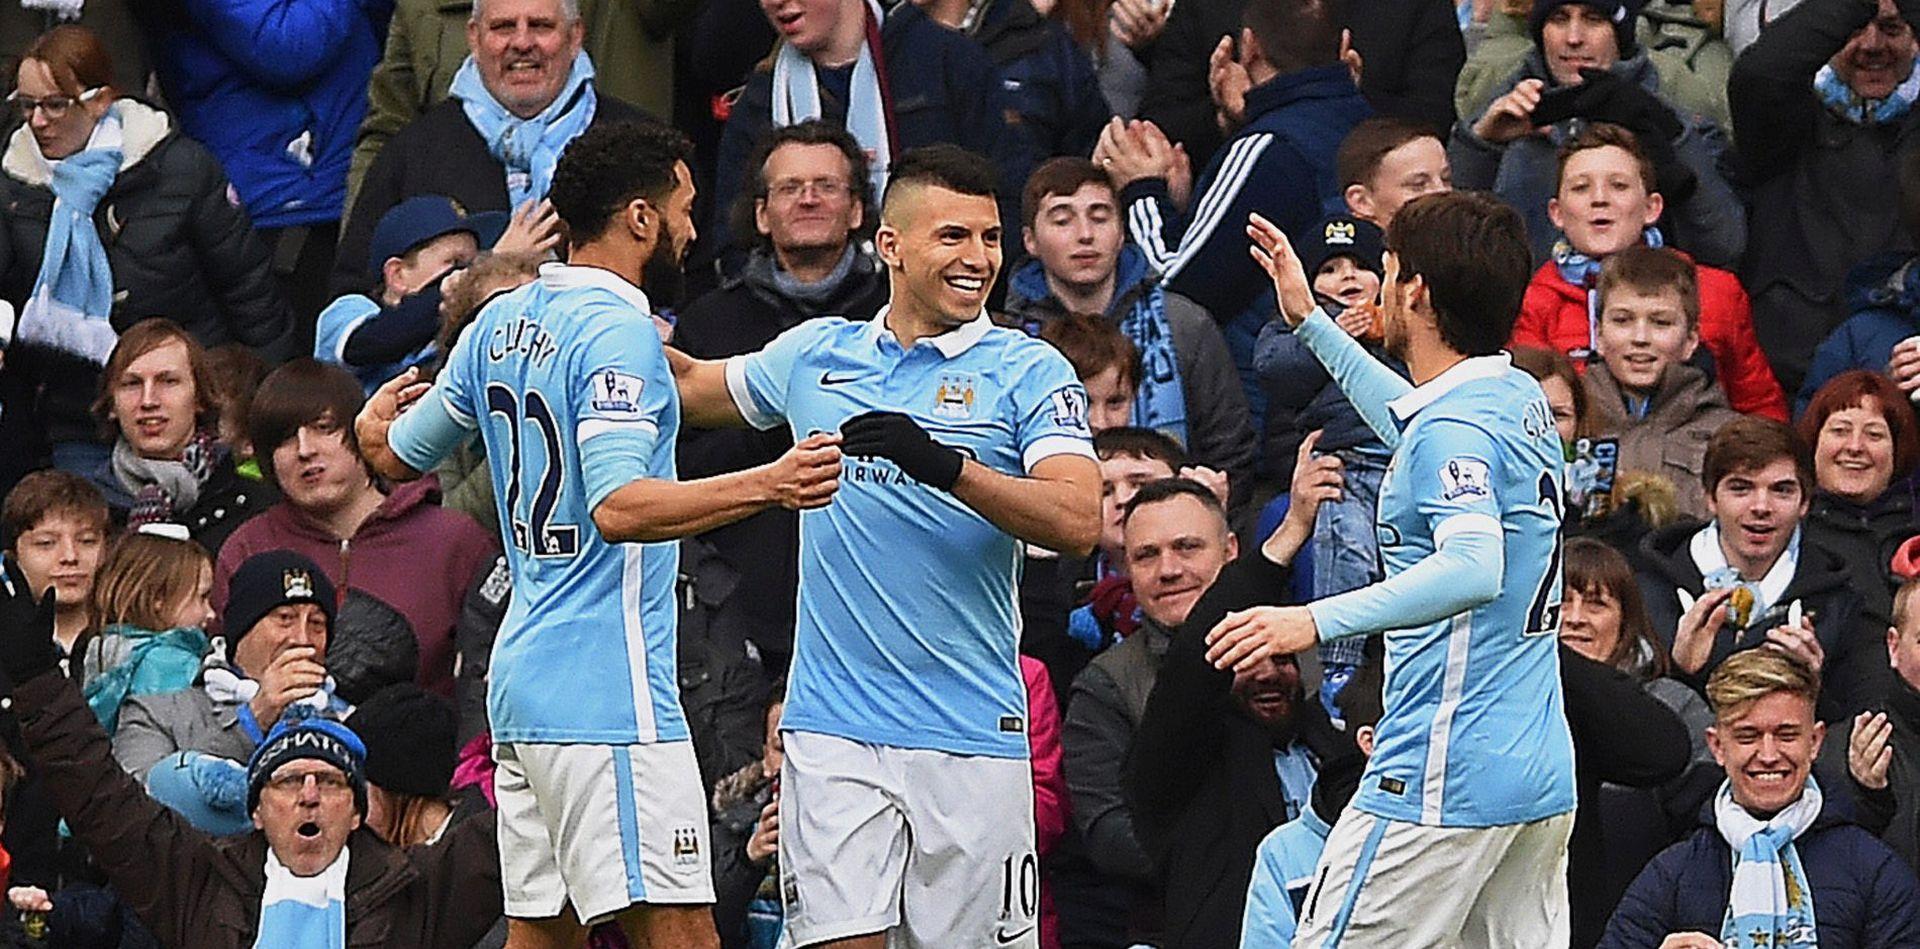 PREMIERSHIP Visoka pobjeda Cityja, Chelsea remizirao sa Stokeom